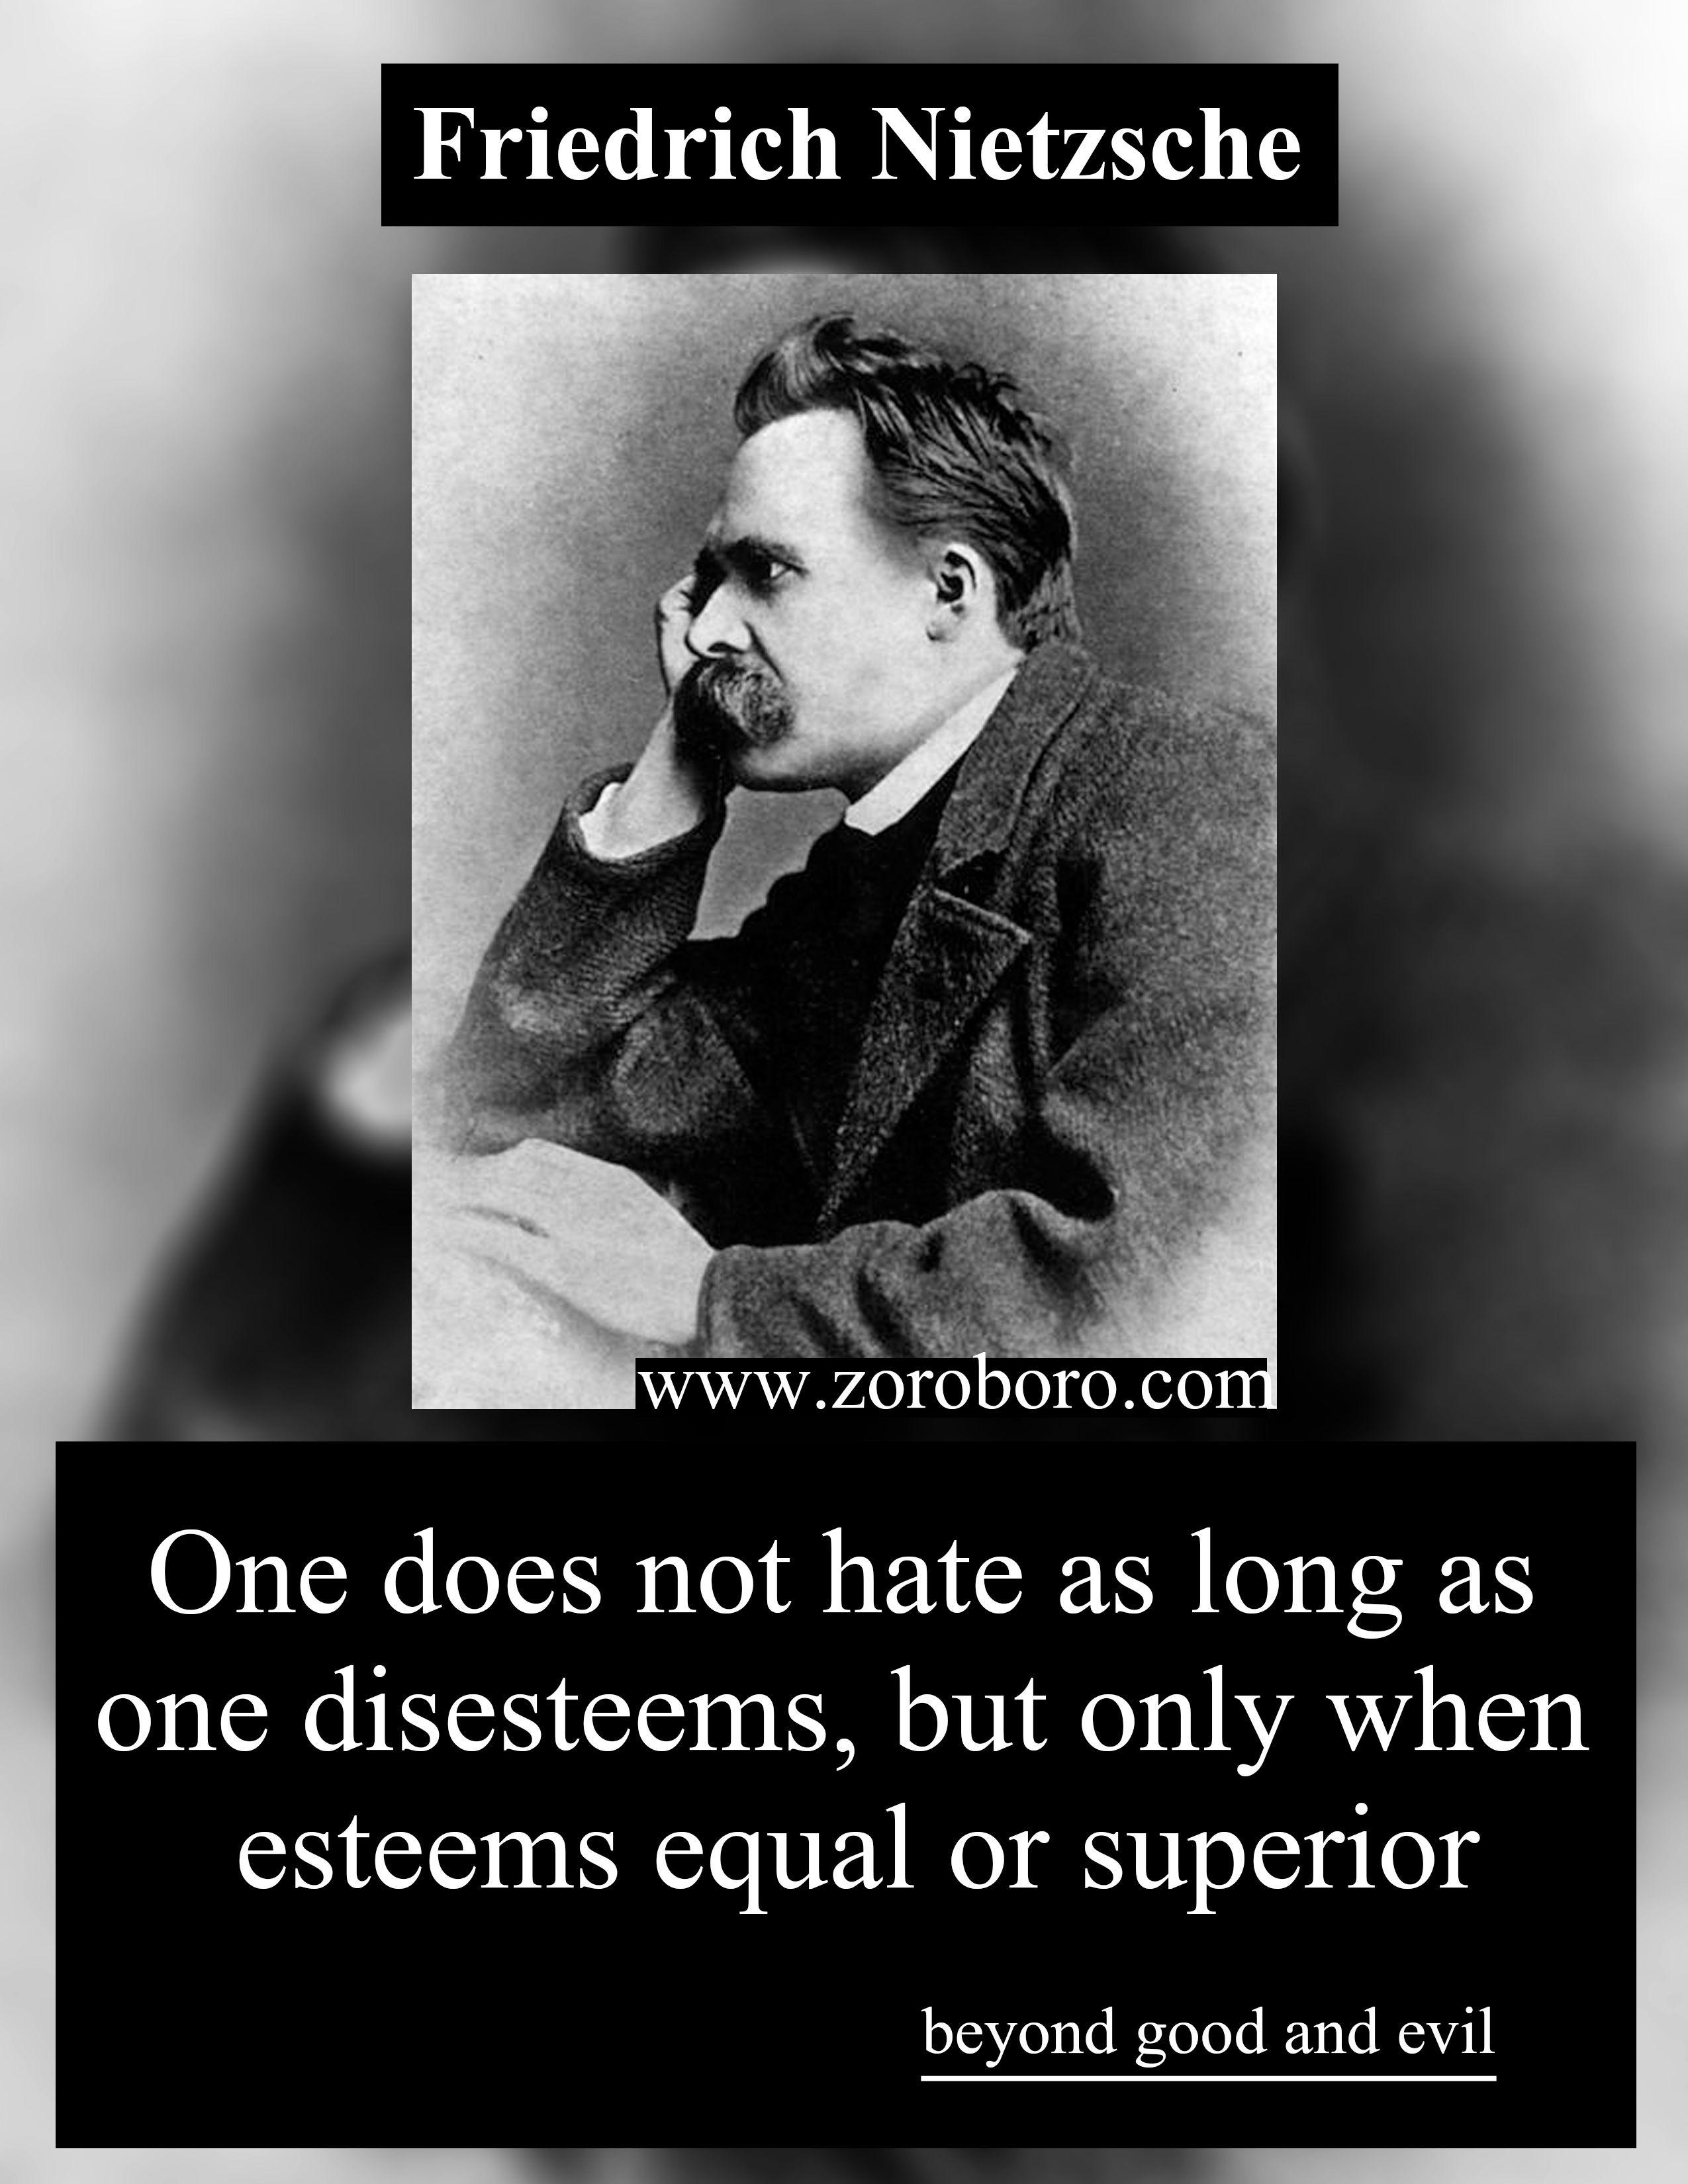 Friedrich Nietzsche Quotes Nietzsche Philosophy On Life Beauty Society Books Teachings Nietzsche Philosophy Nietzsche Quotes Friedrich Nietzsche